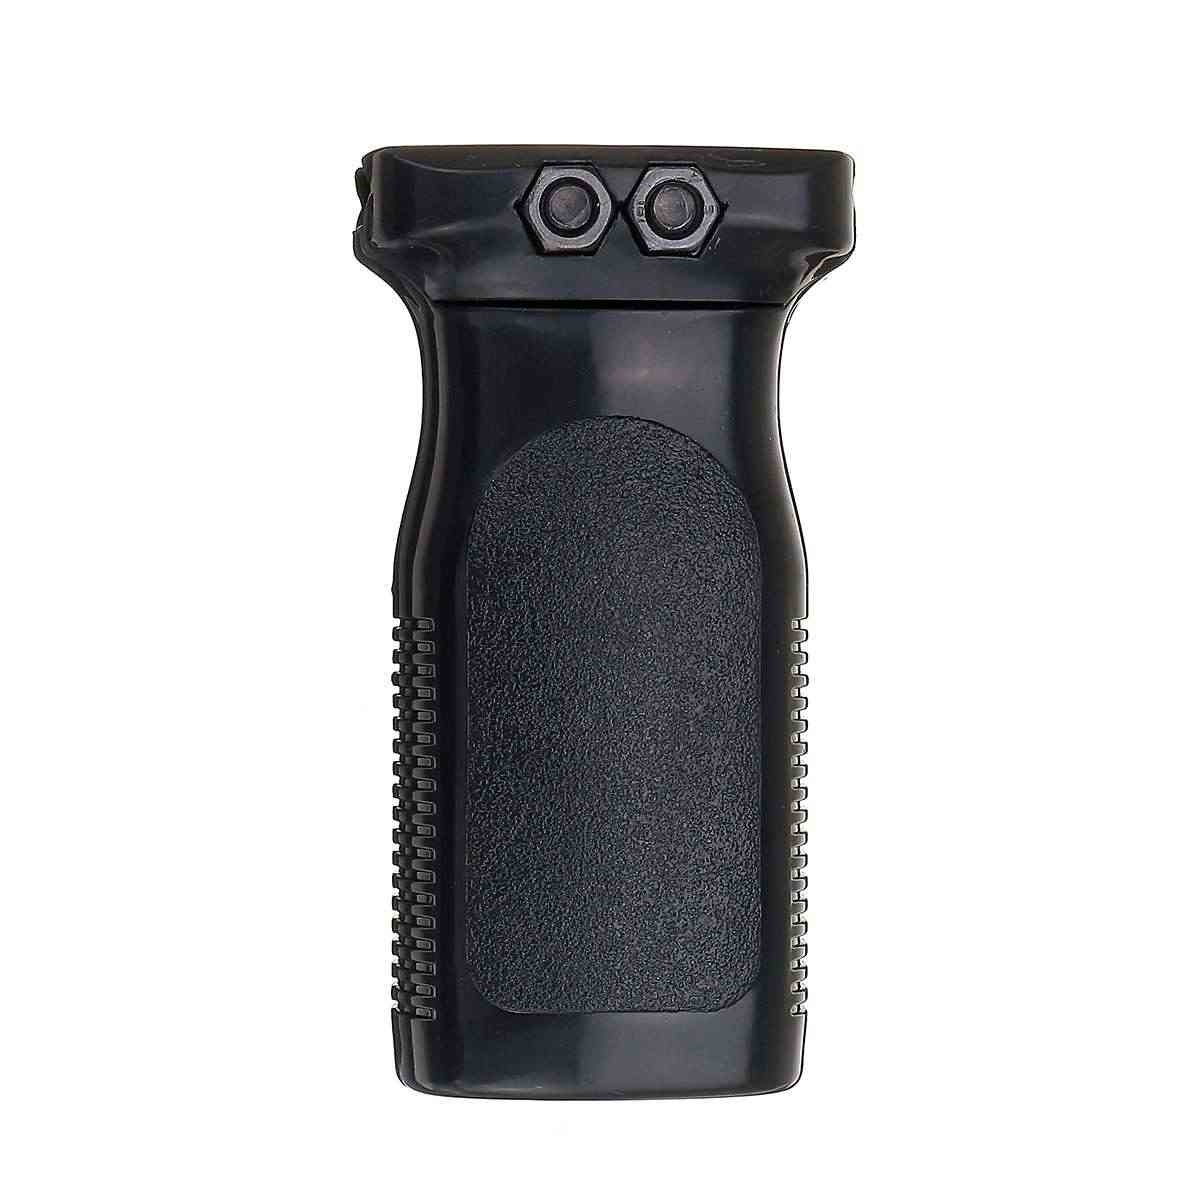 RVG Style Grip